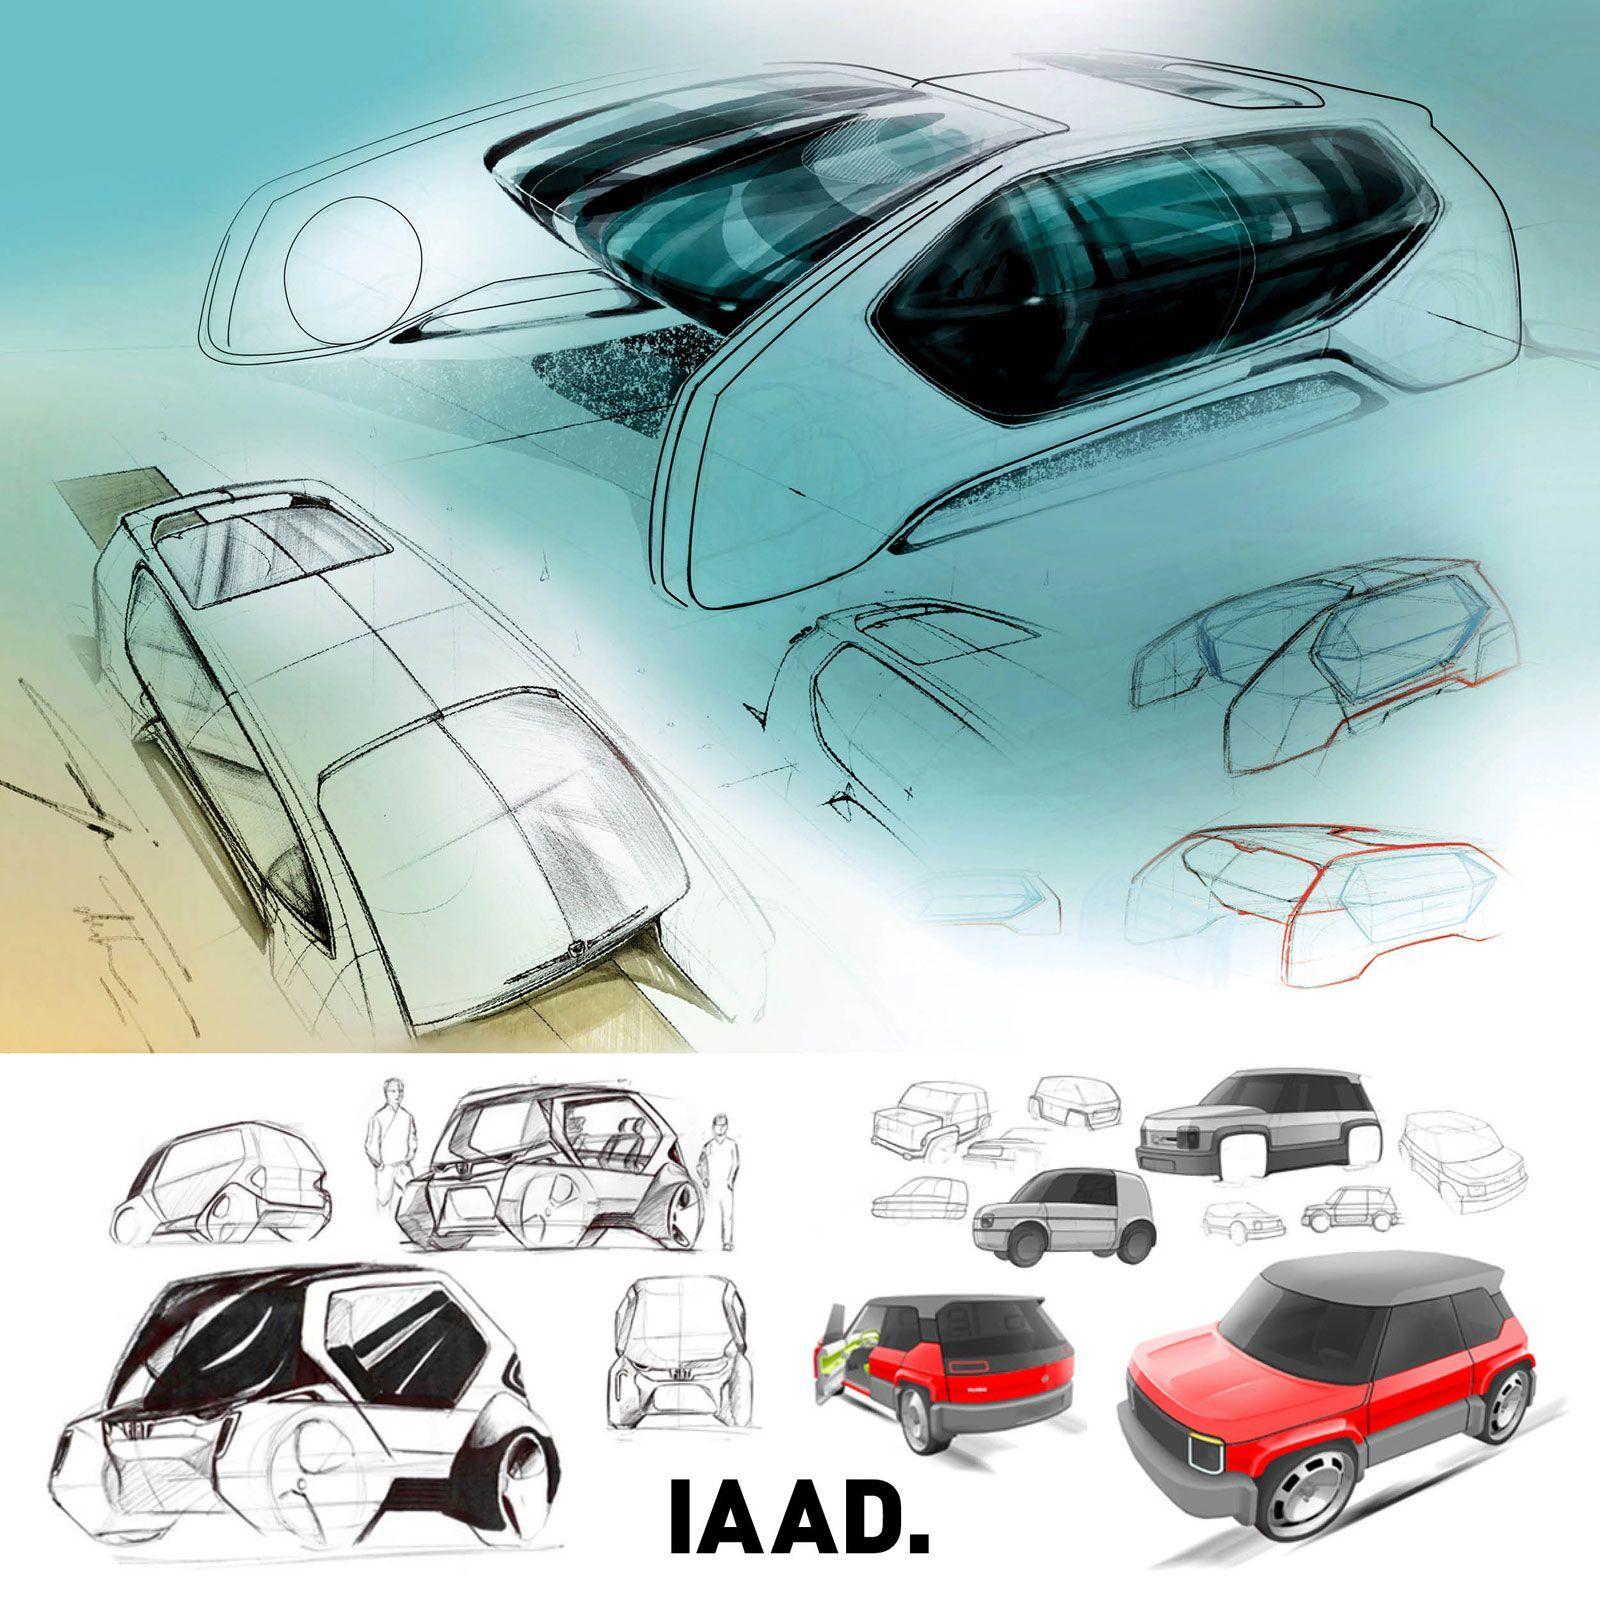 FIAT Panda Design Contest by IAAD: the winners  #iaad #design #designschool #cardesign  #automotivedesign #autodesign #cardesignworld #cardesignercommunity #cardesignpro #carbodydesign #cardesigner #vehicledesign #conceptcar #fiatpanda #giugiaro #transportationdesign